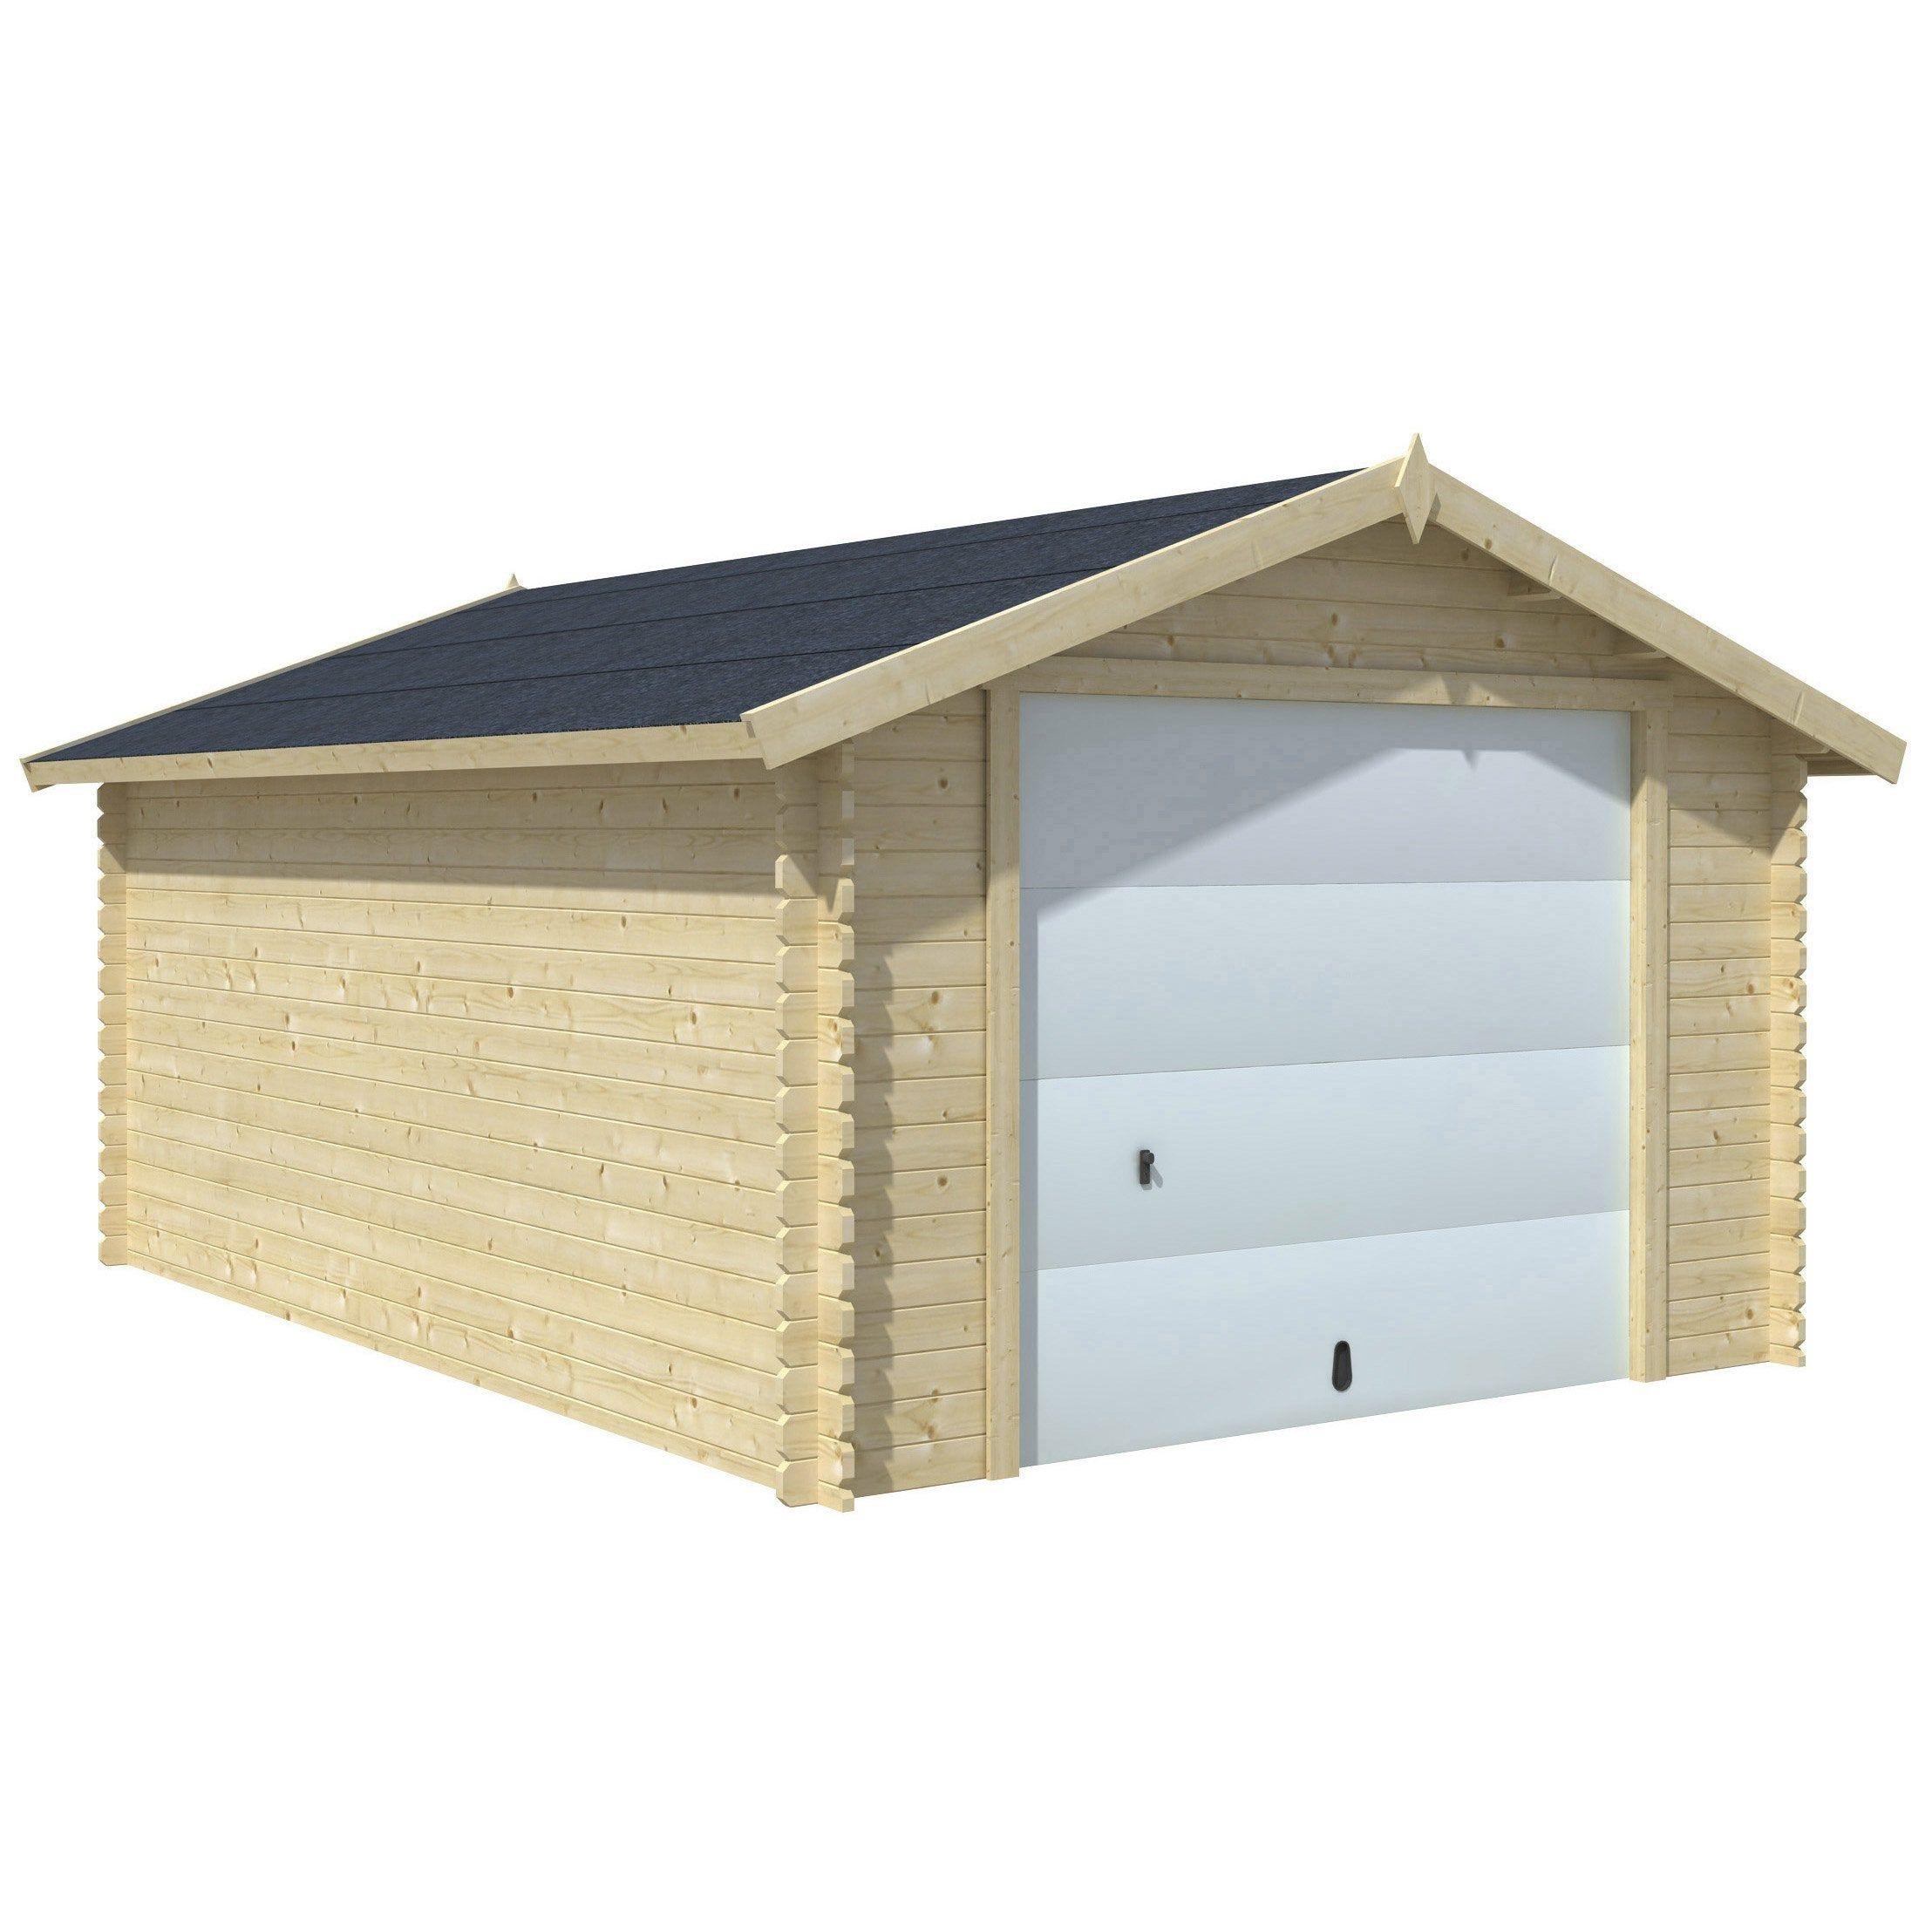 Garage Bois Nova 1 Voiture, 16.91 M² So Garden | Abri De ... concernant Abri Moto Bois